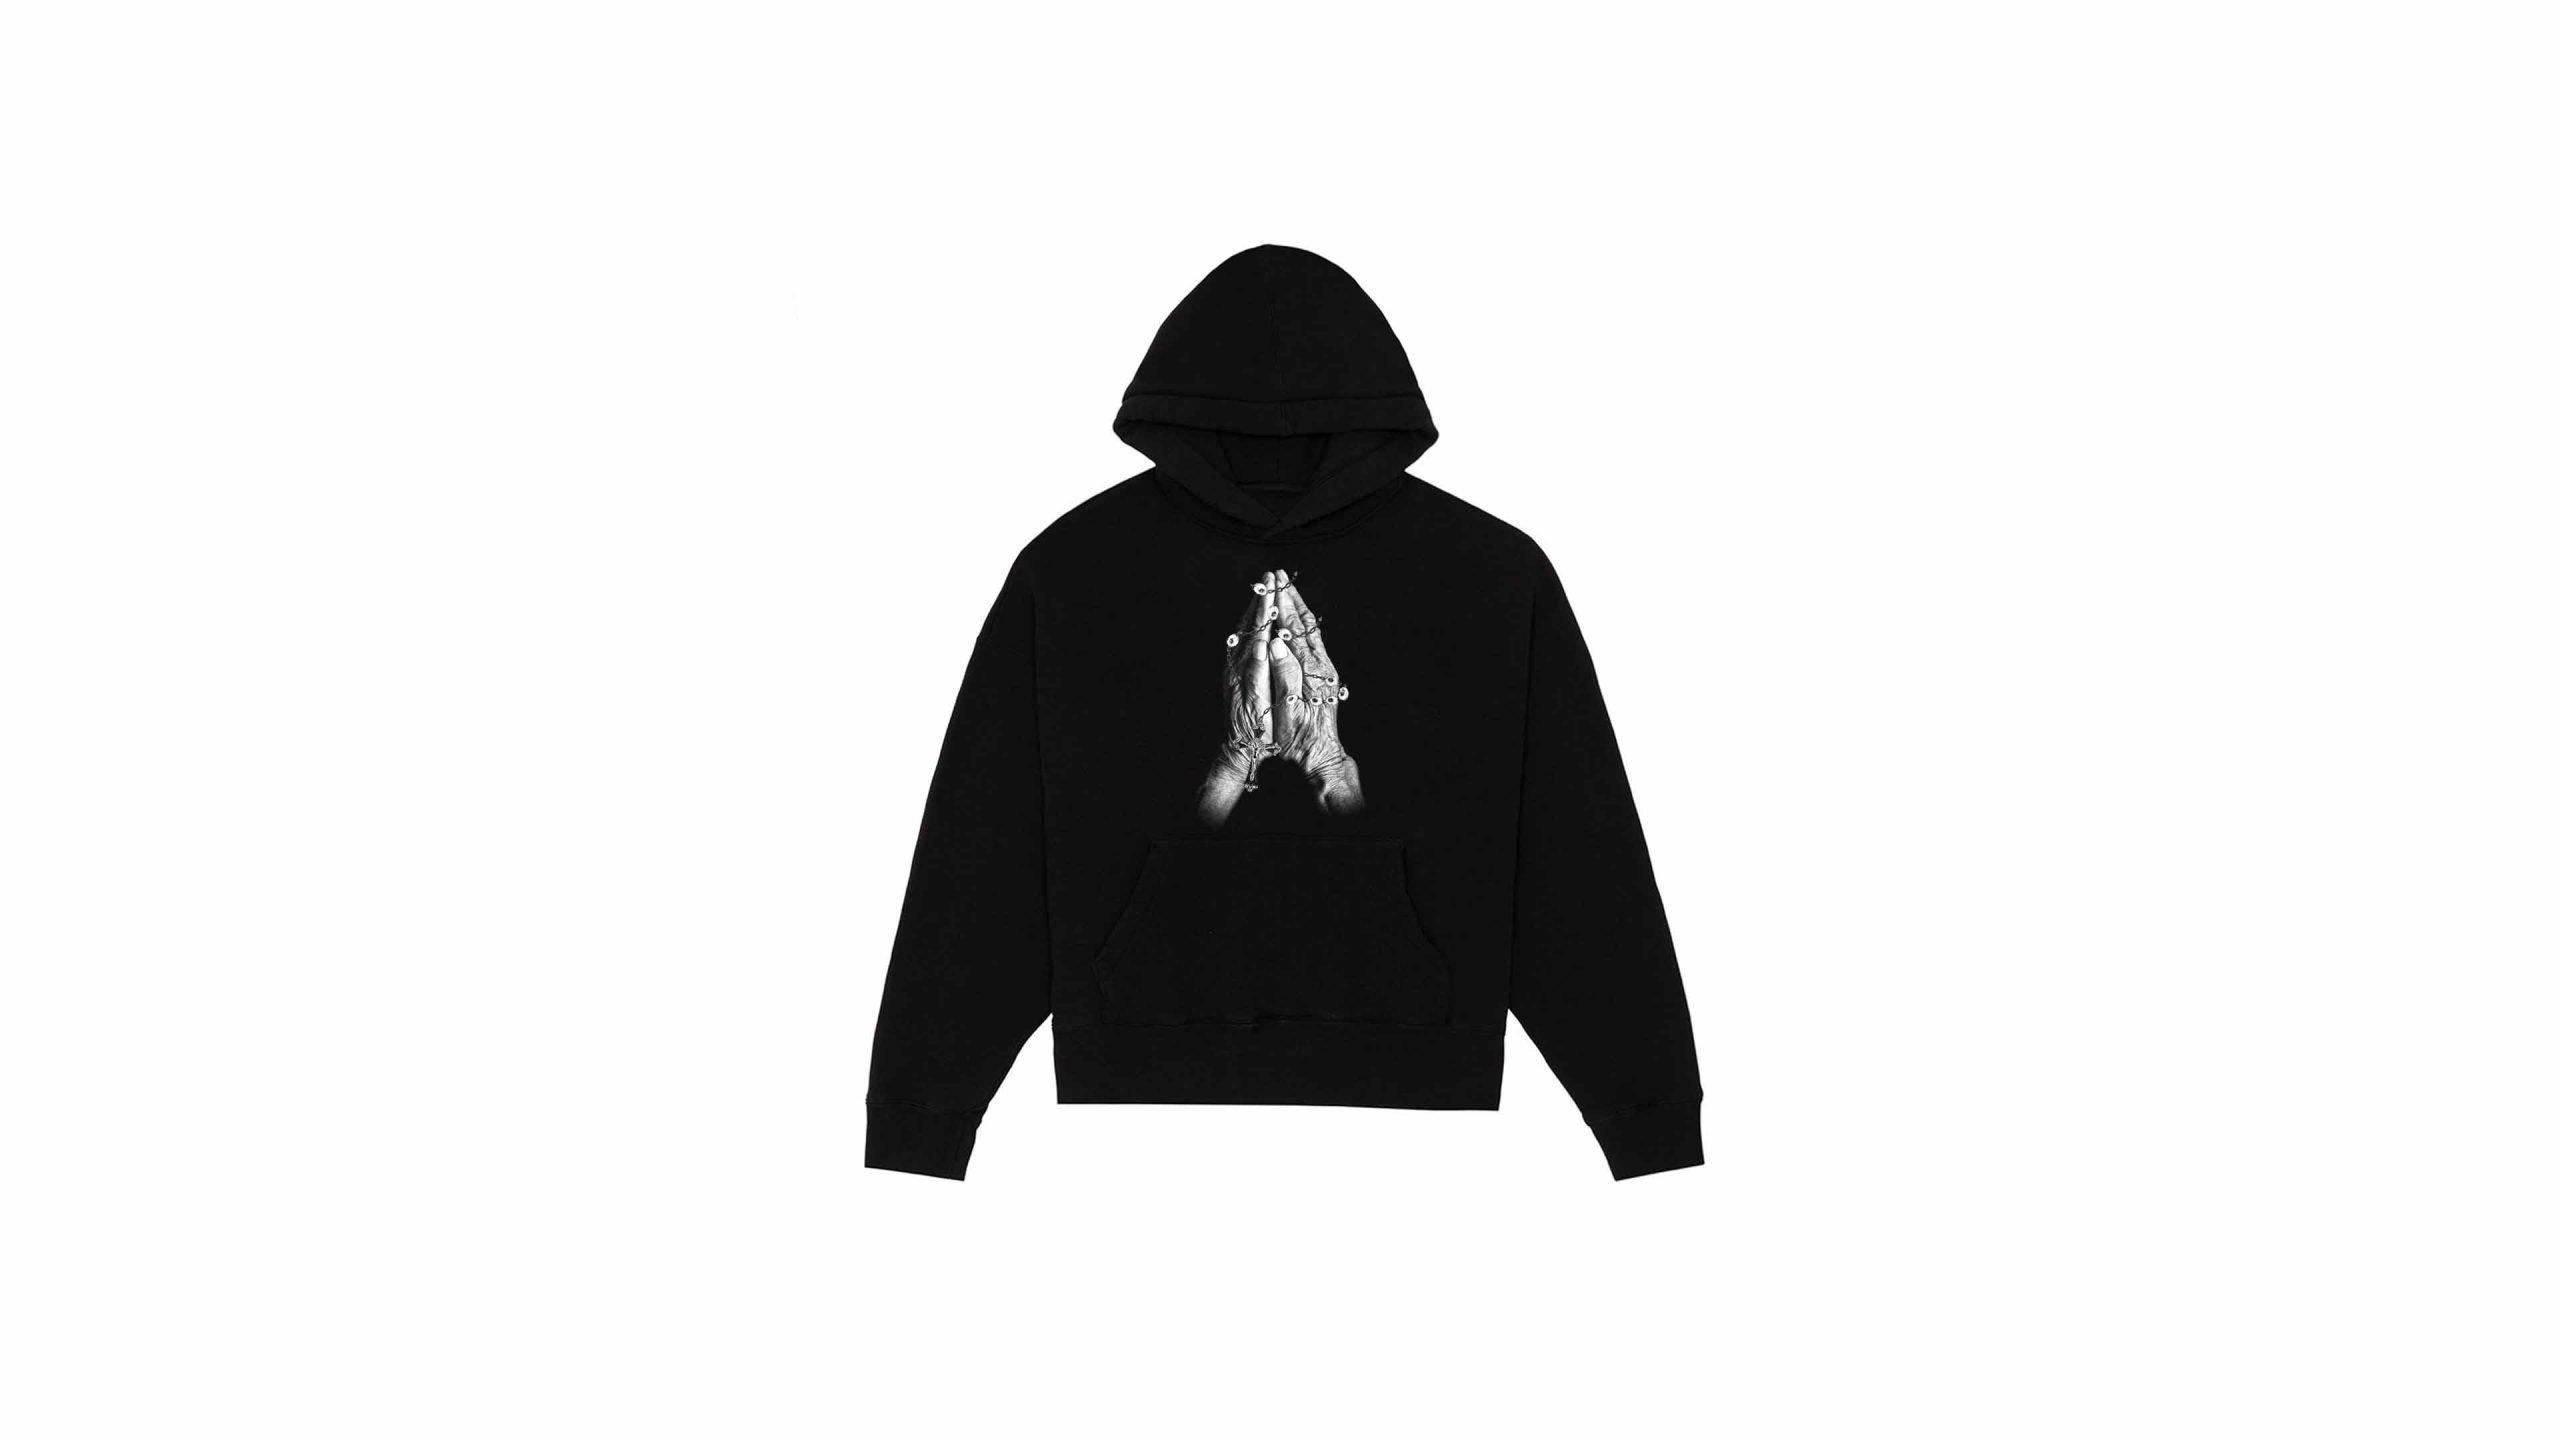 GUE-PEQUENO-SINATRA-merch-graphics-hands-hoodie-front